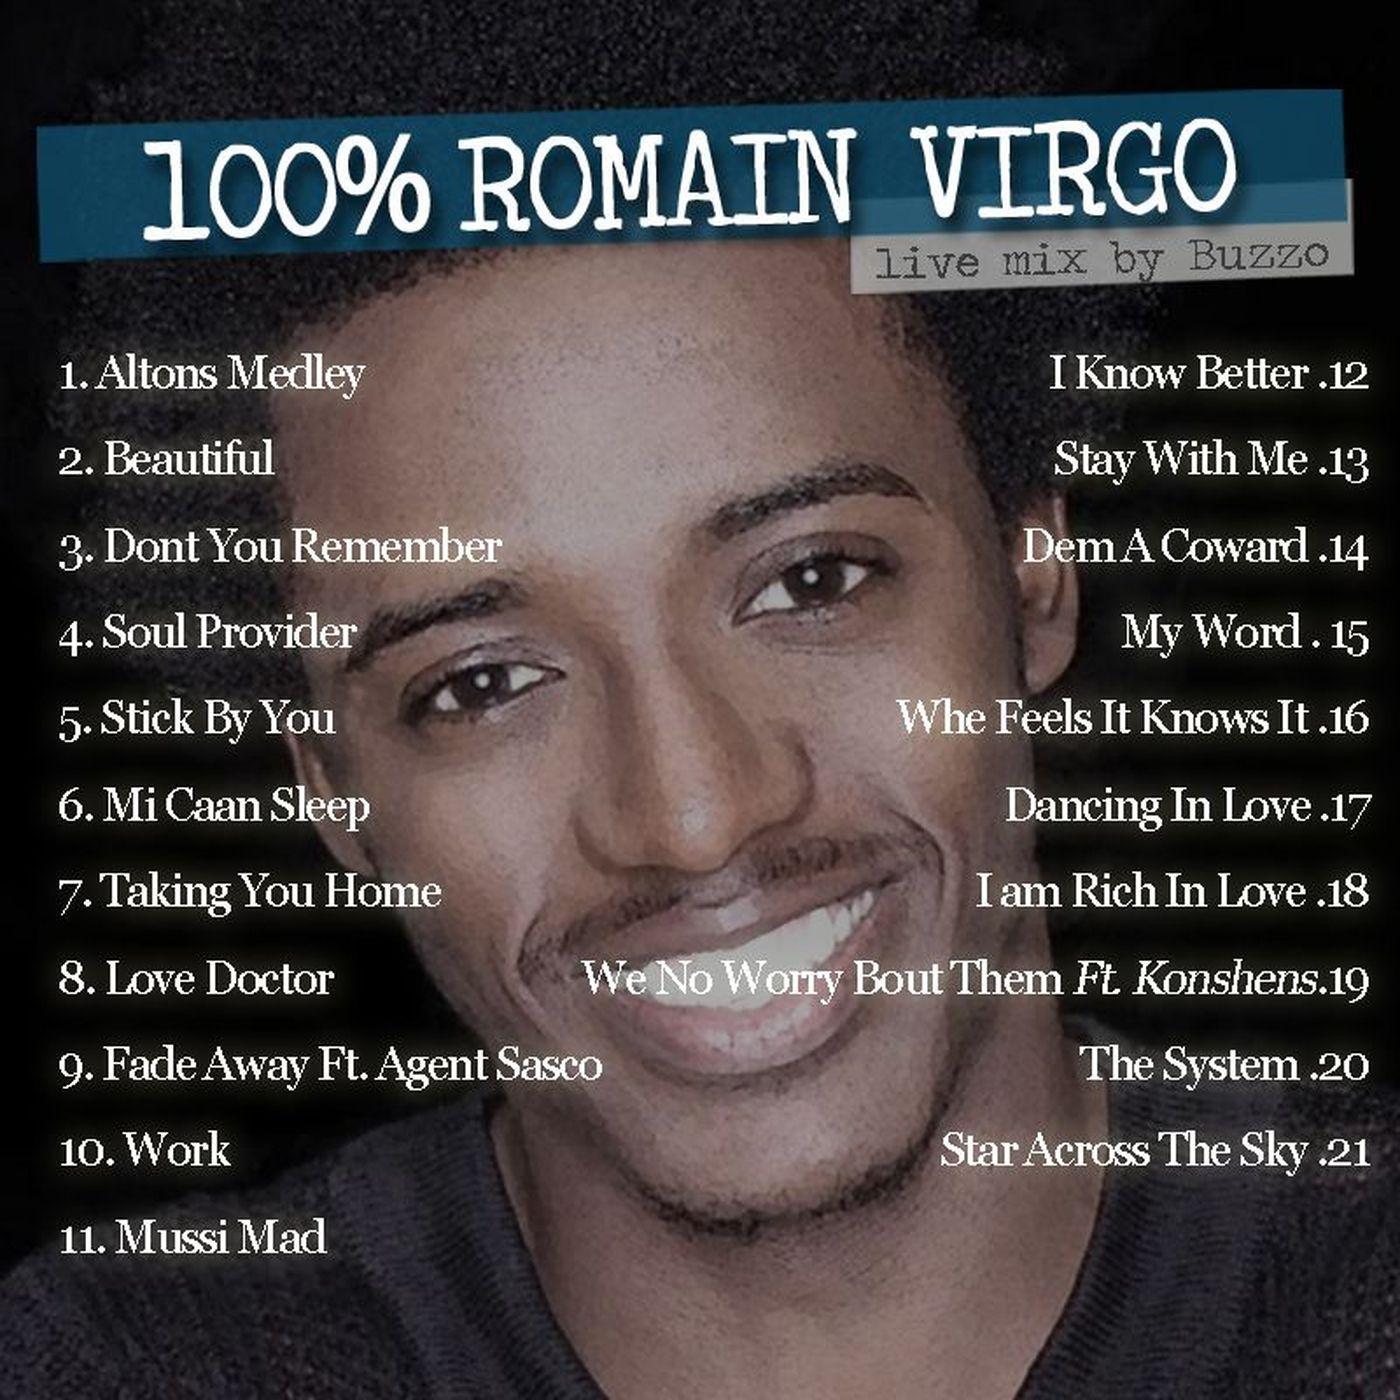 Romain virgo songs download